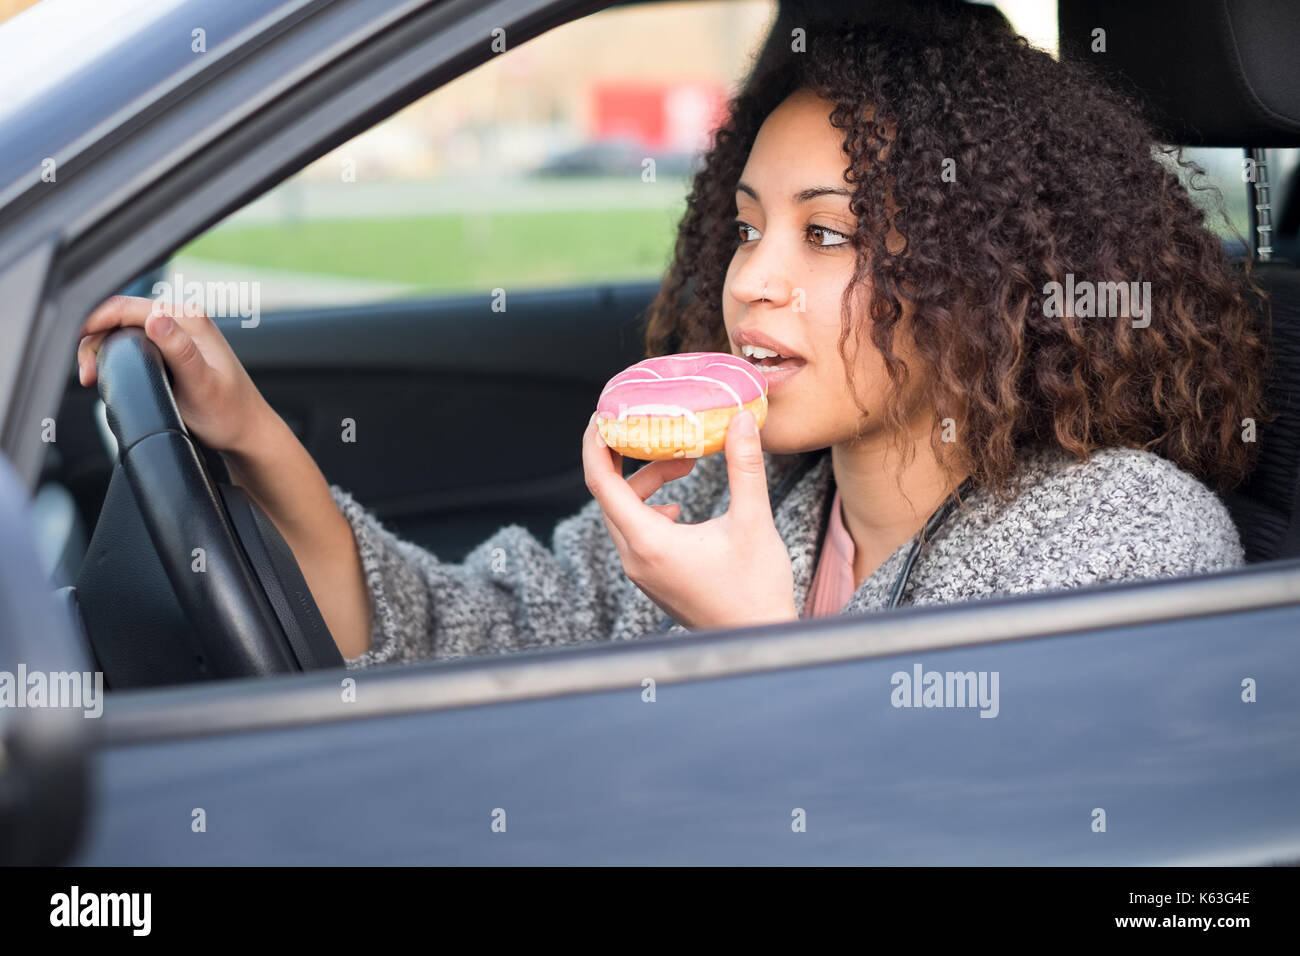 Woman eating a sweet conduisant sa voiture Photo Stock